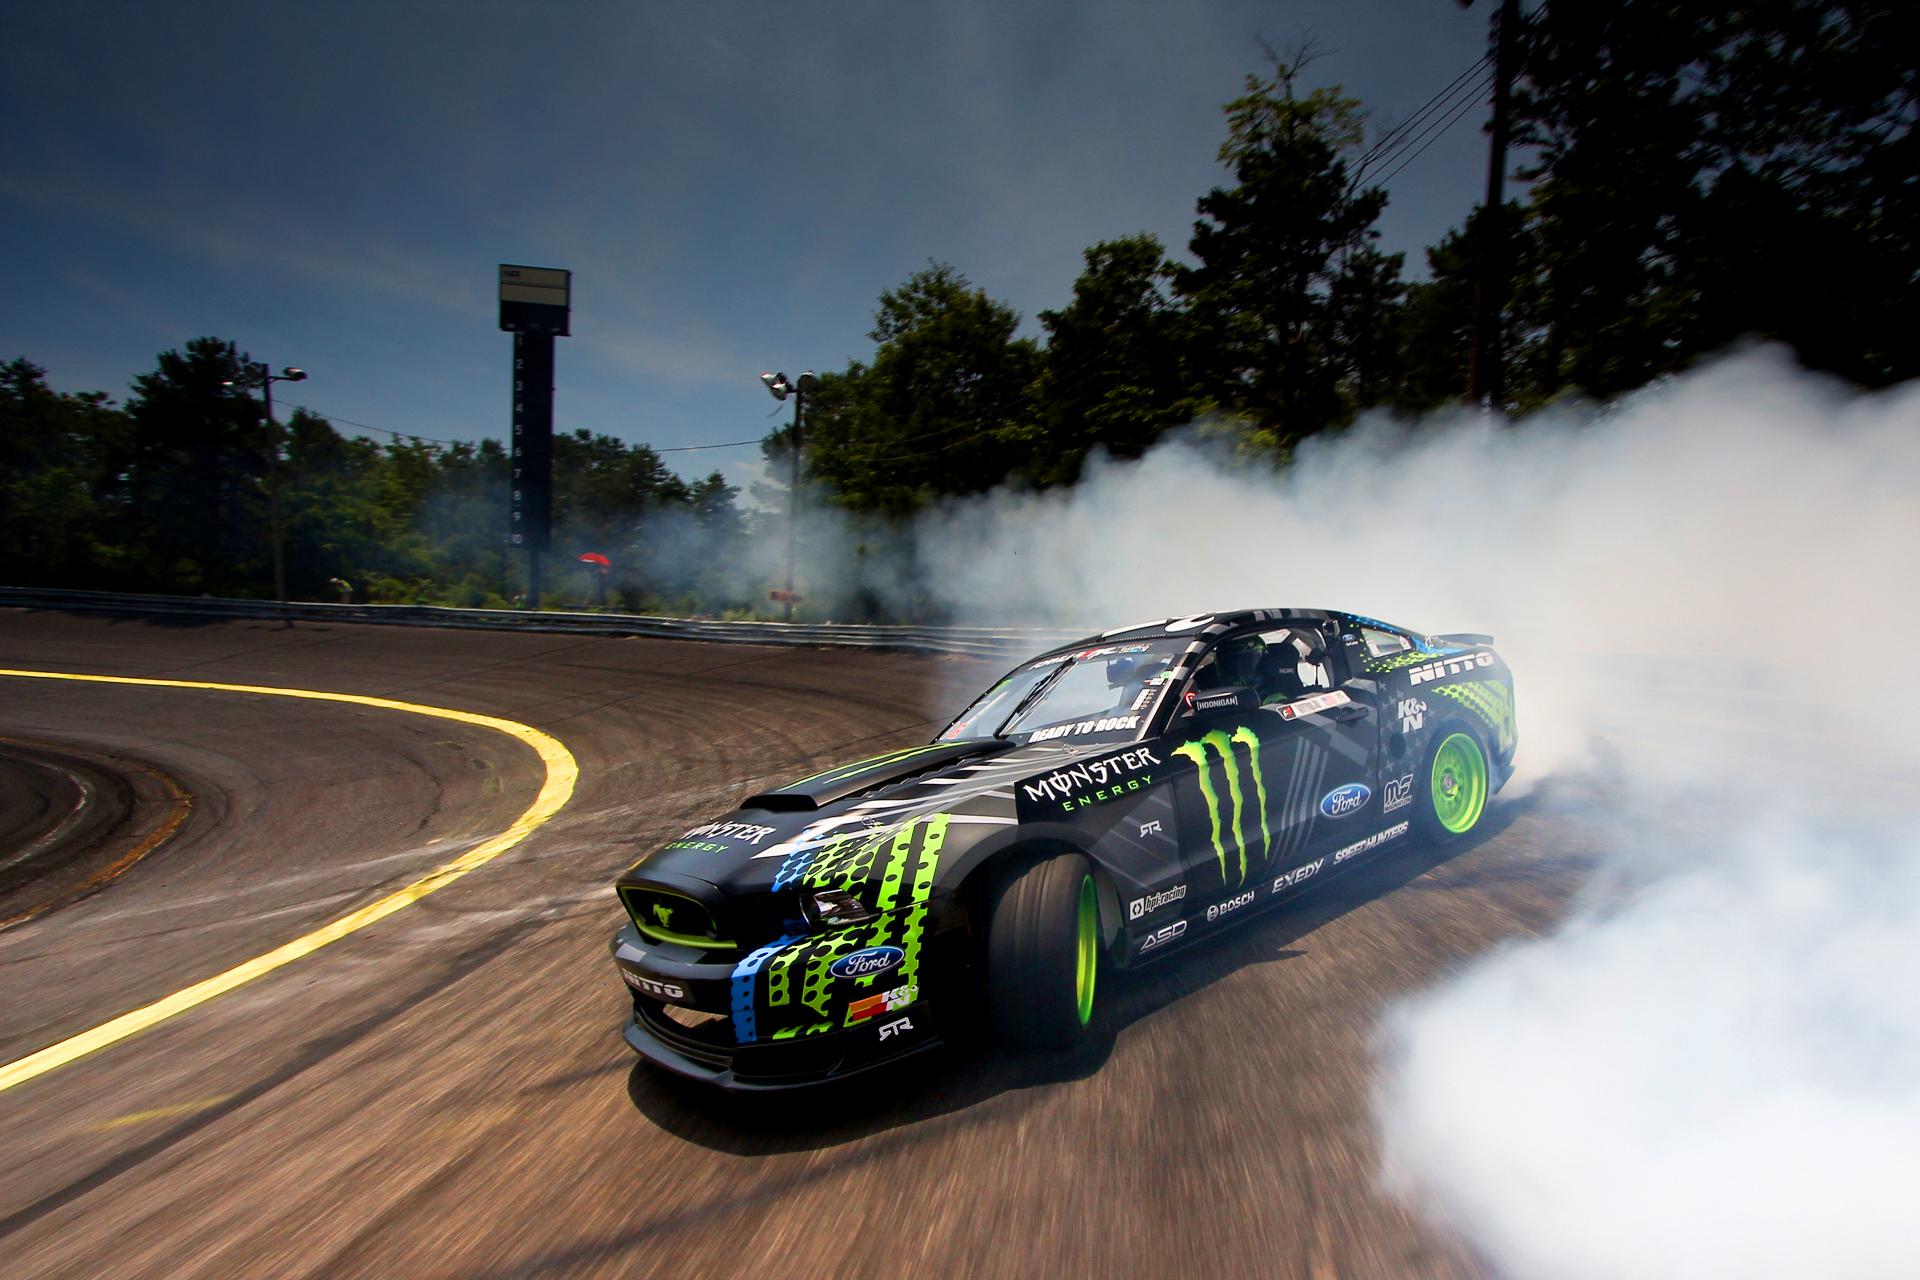 Wallpaper Race Cars Smoke Ford Mustang Sports Car Drift Race